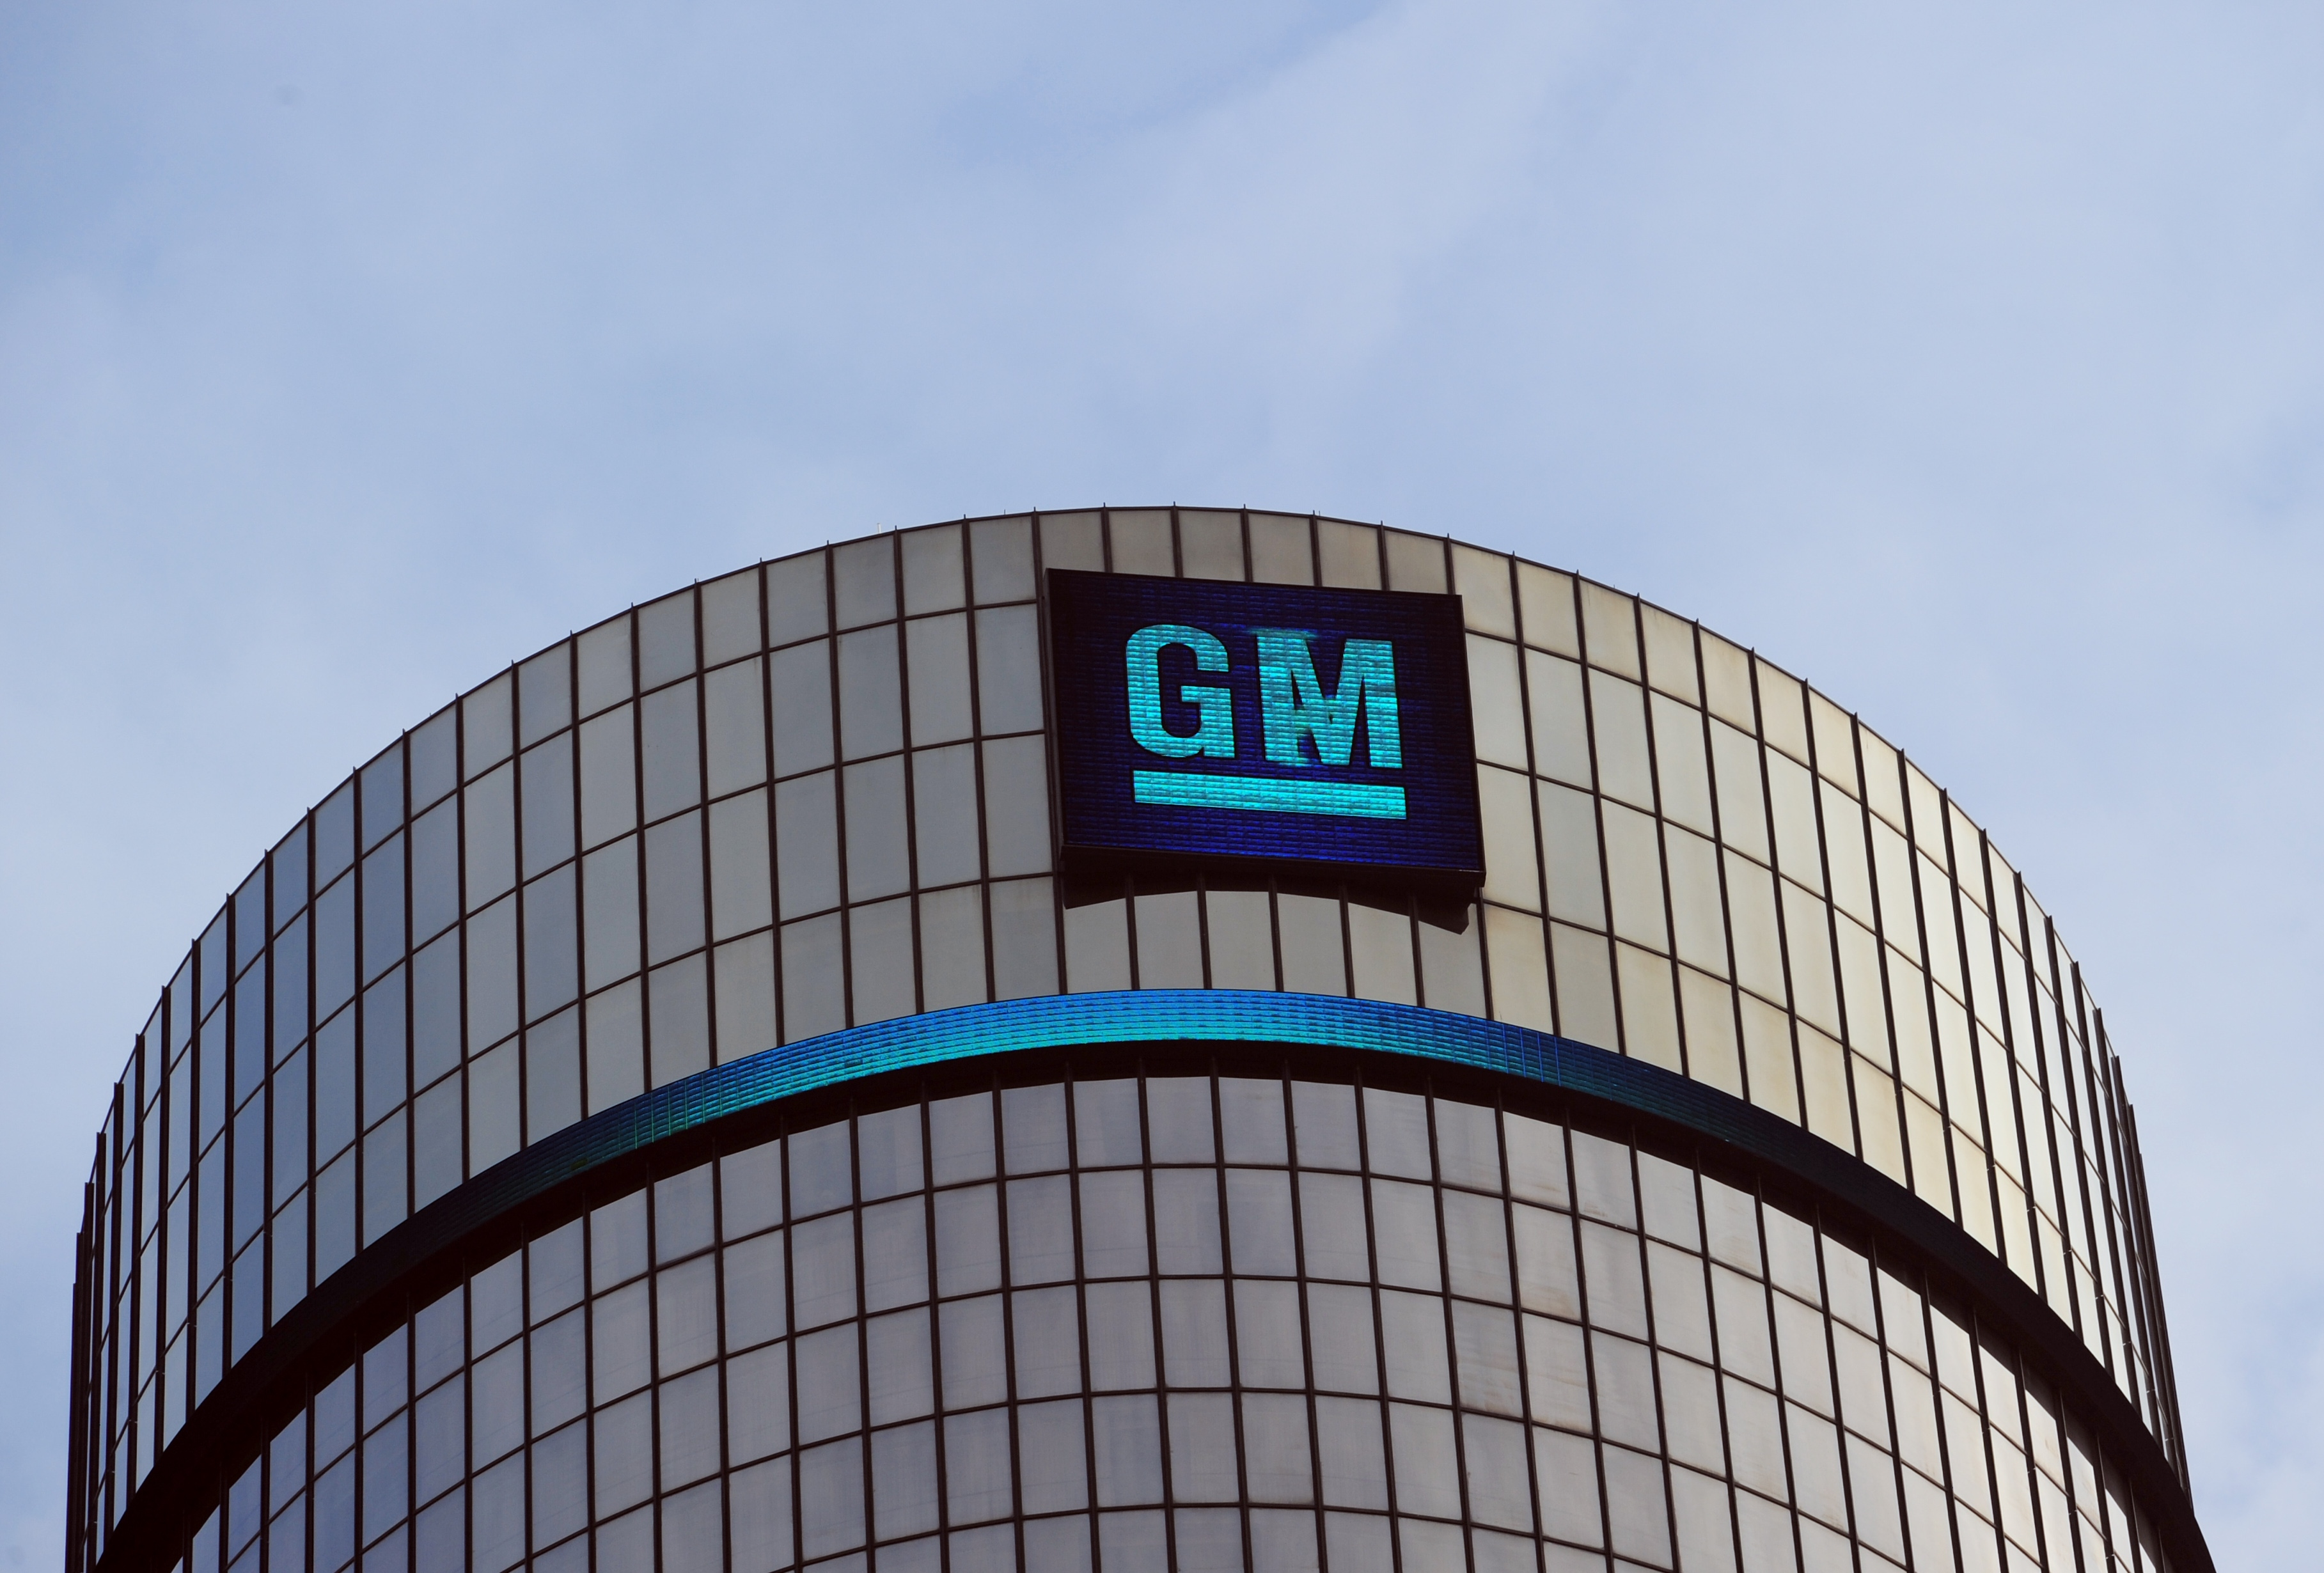 Chevrolet, Opel, авторынок, General Motors, дилеры, распродажа, Россия